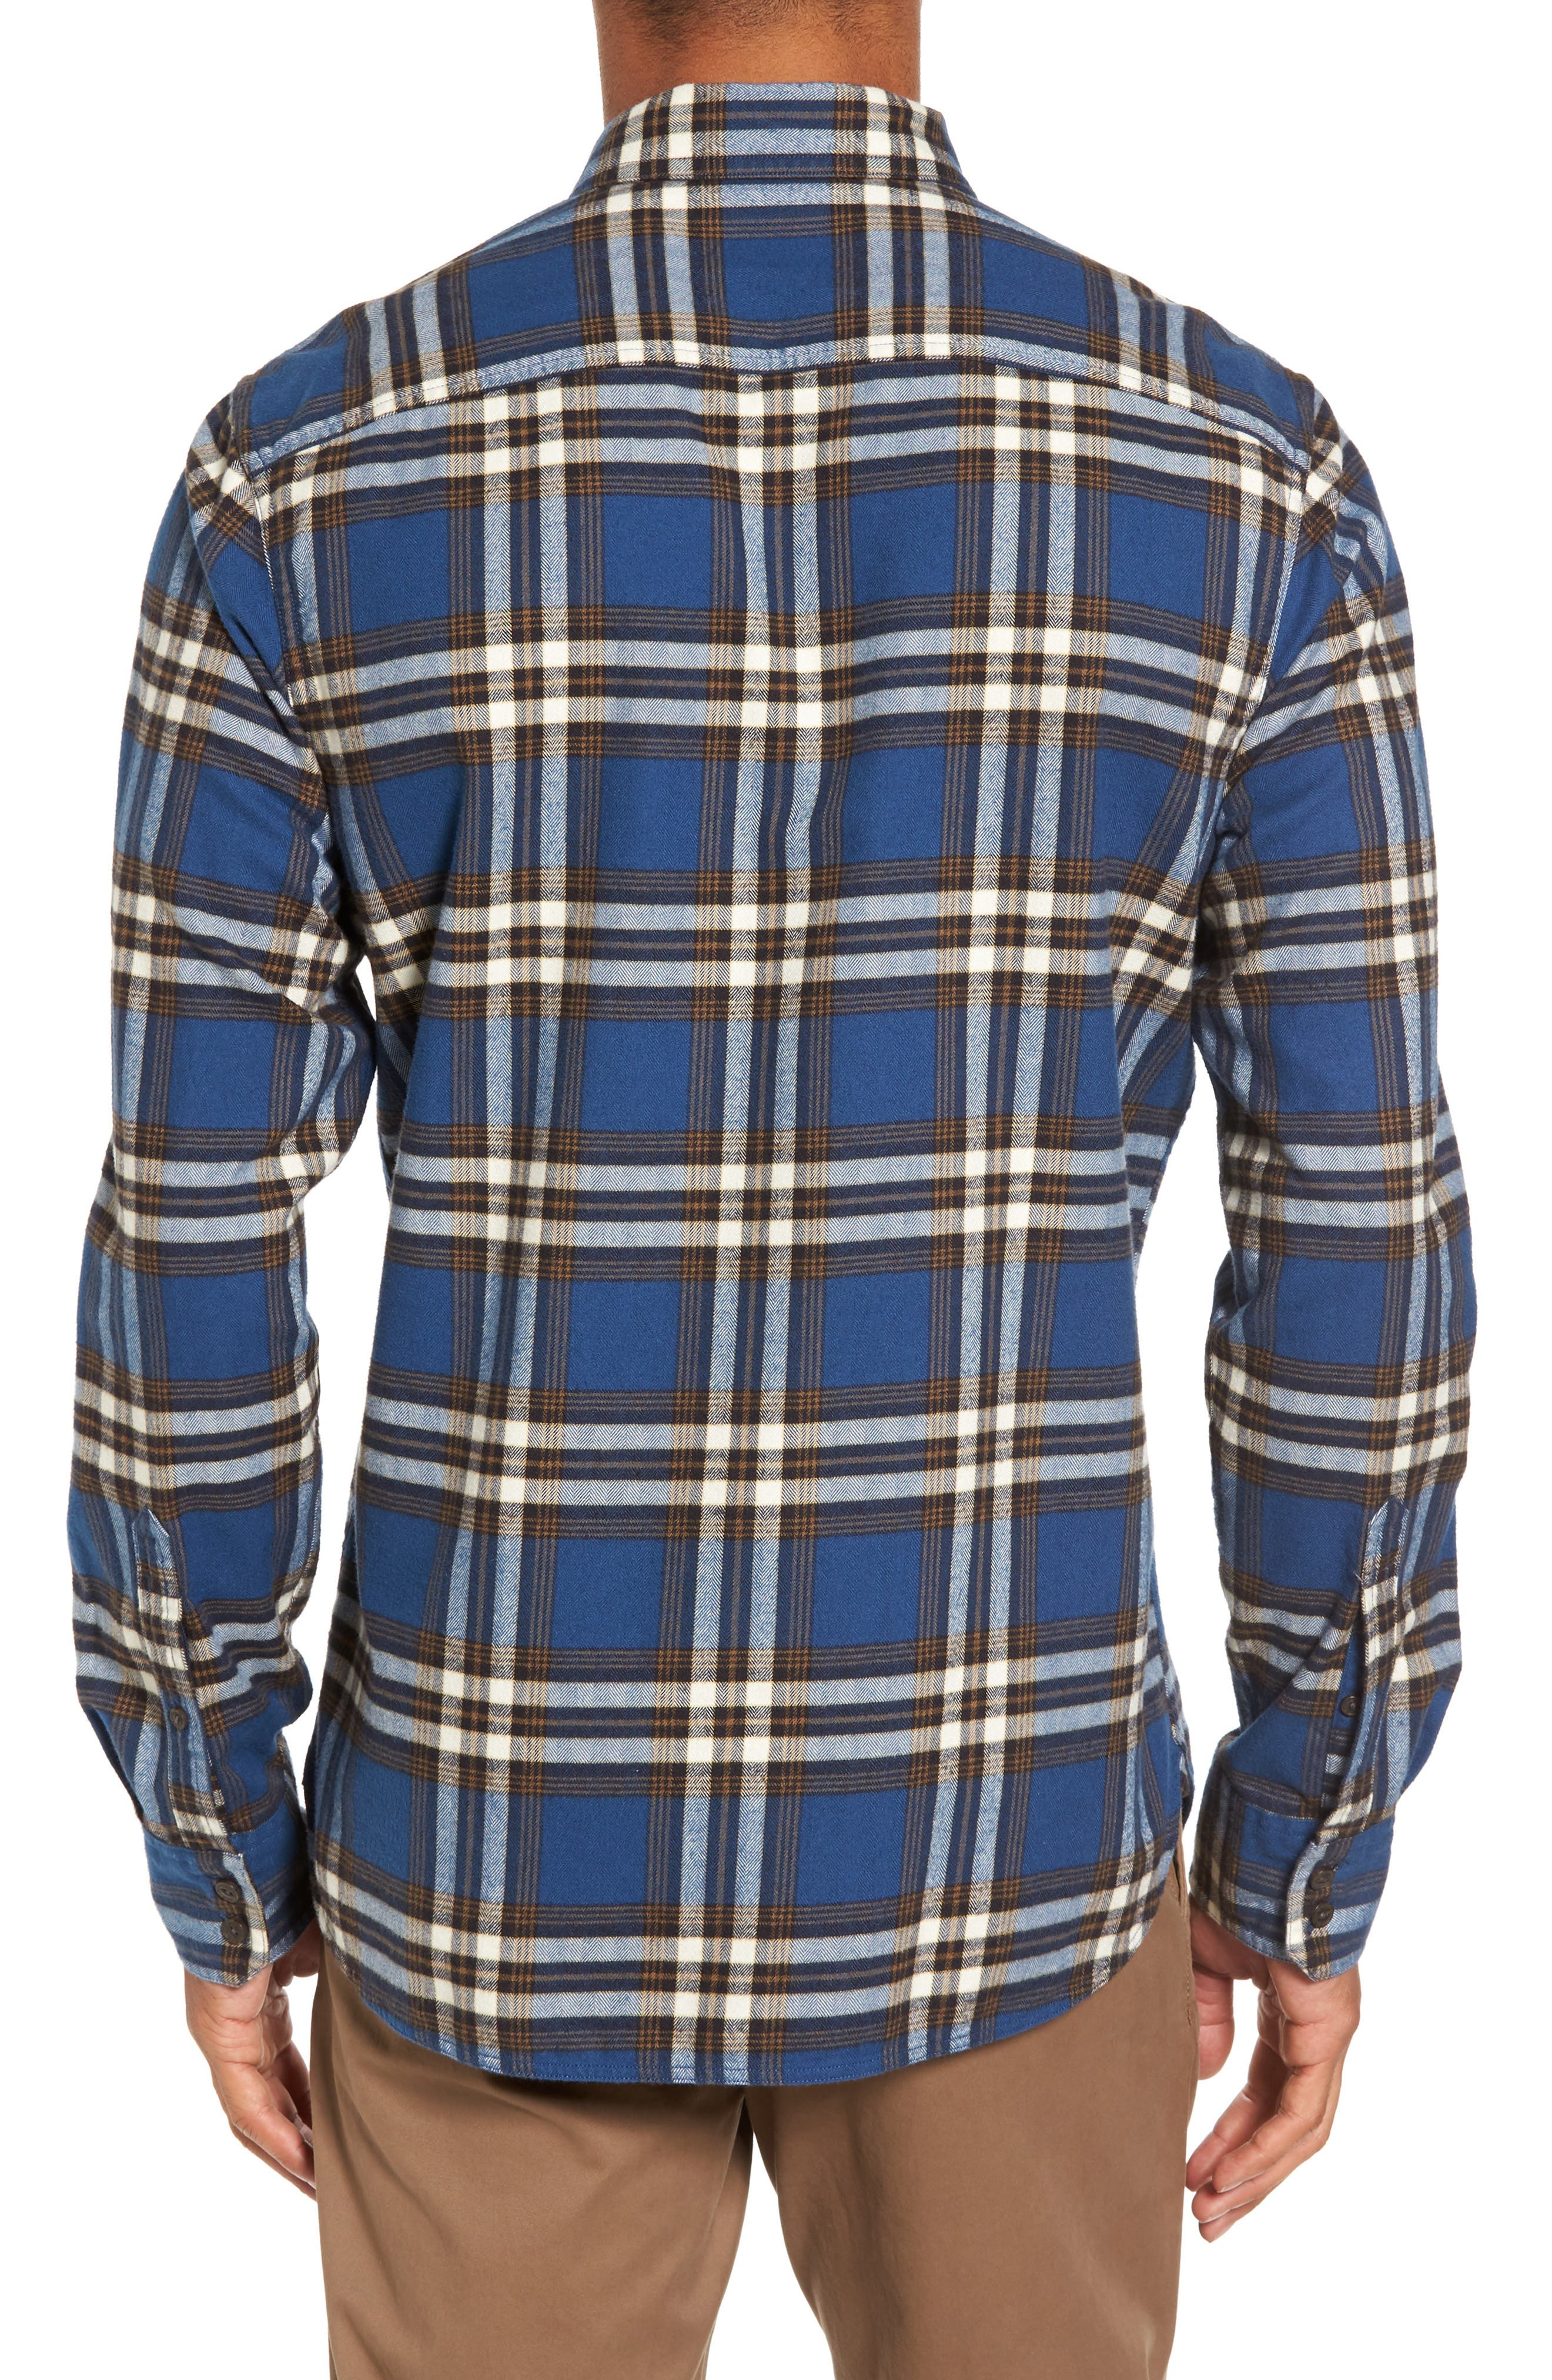 Alternate Image 2  - Nordstrom Men's Shop Trim Fit Workwear Check Flannel Shirt